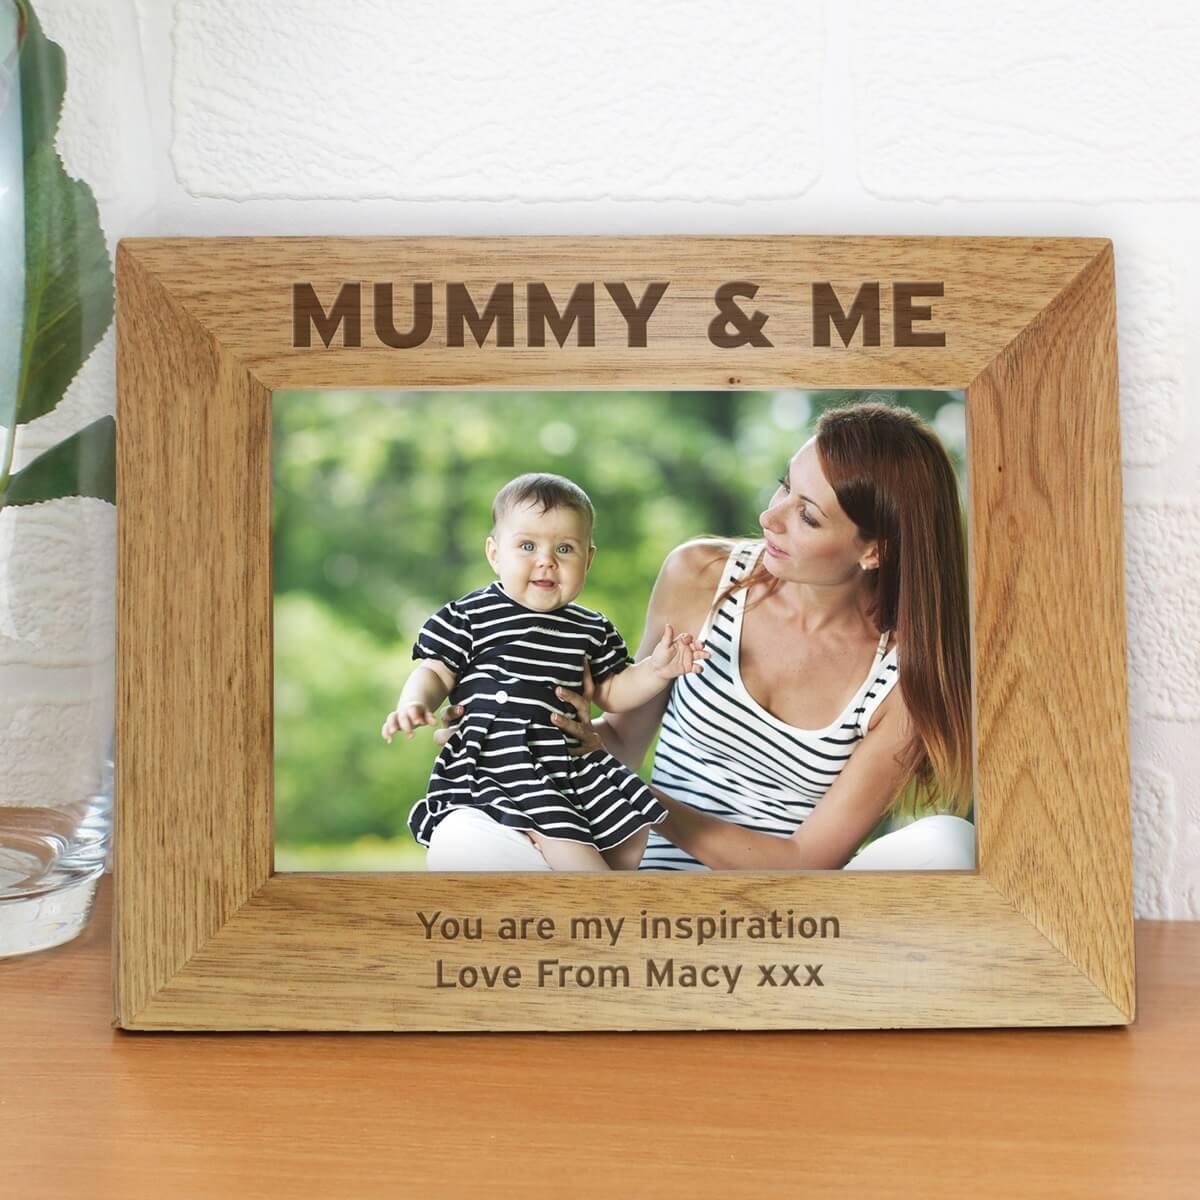 Personalised Mummy & Me 7×5 Landscape Wooden Photo Frame